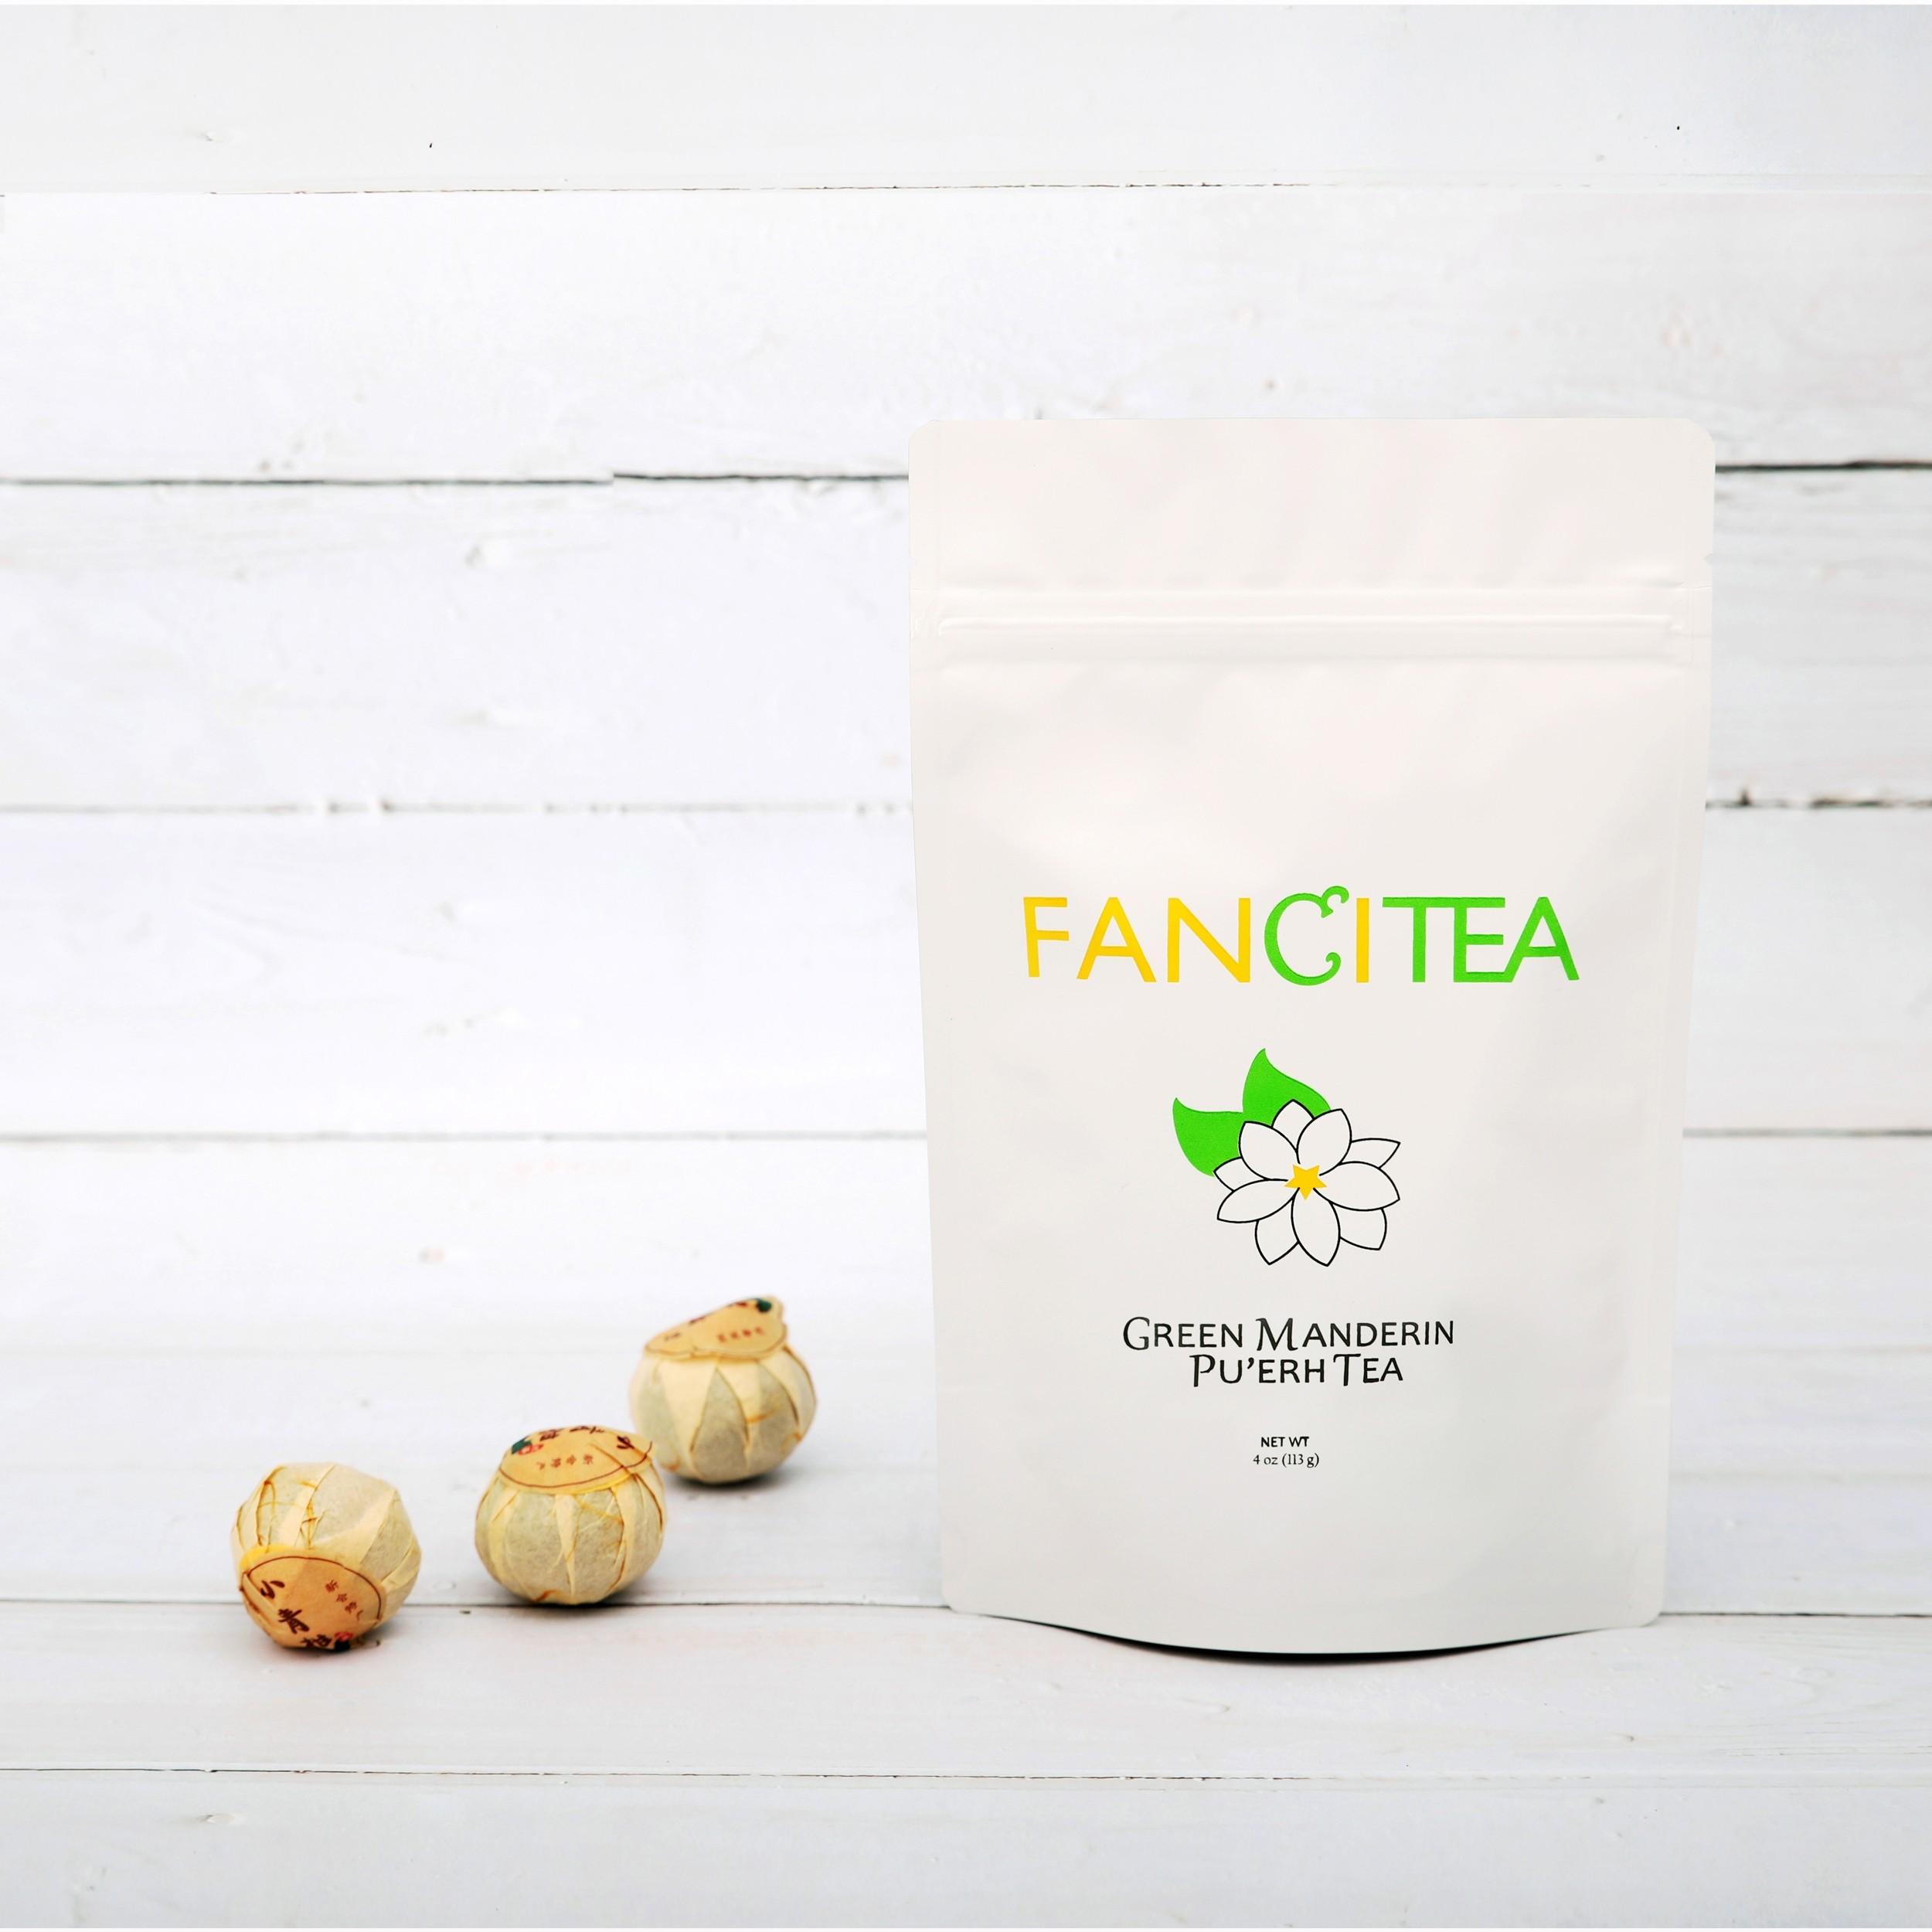 Fancitea High Quality Chinese Pu'erh Tea With Ripe Green Mandarin 4oz